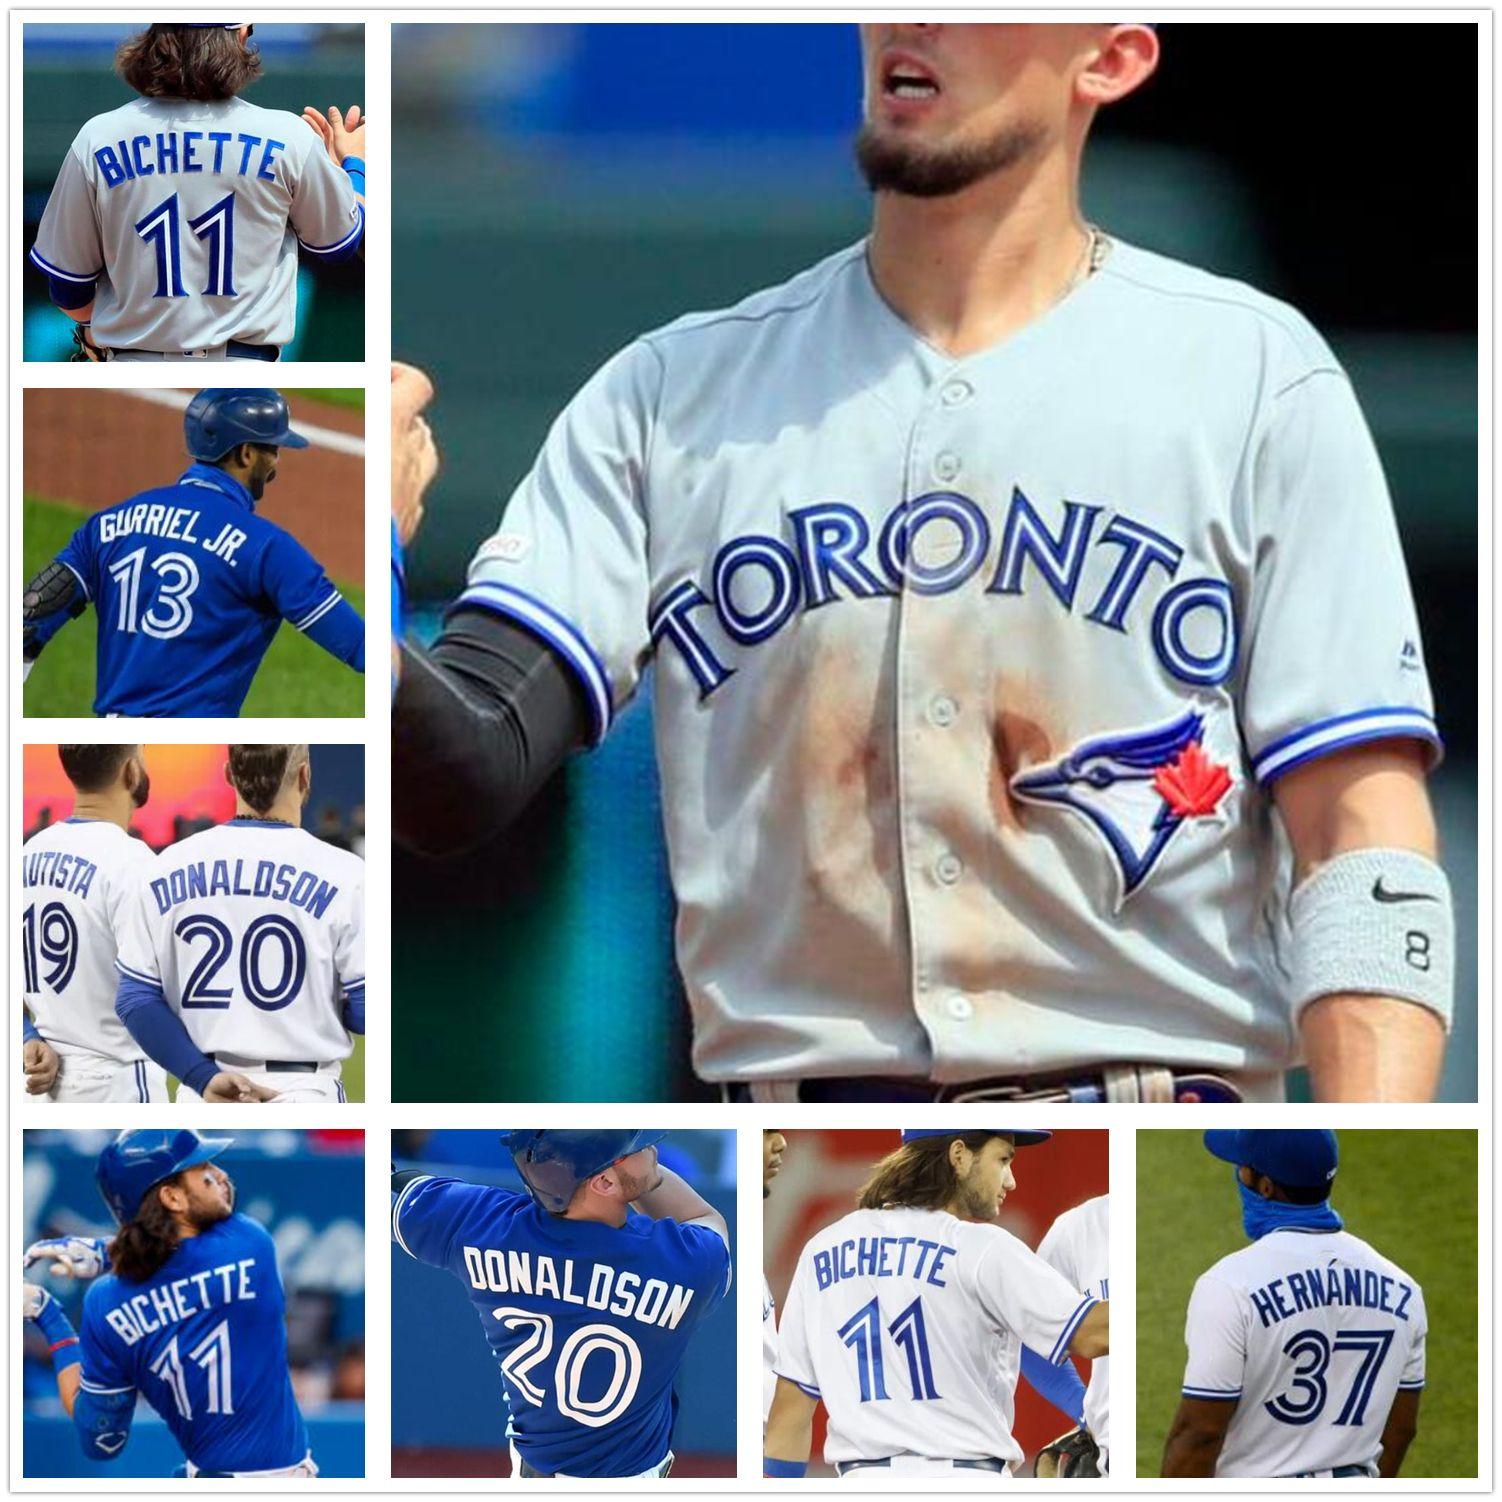 Toronto College Baseball trägt Blue Vladimir Guerrero Jr. Jays Cavan Biggio Hyun-Jin Ryu Yamaguchi Randal Grichuk Drury Hernandez Jansen